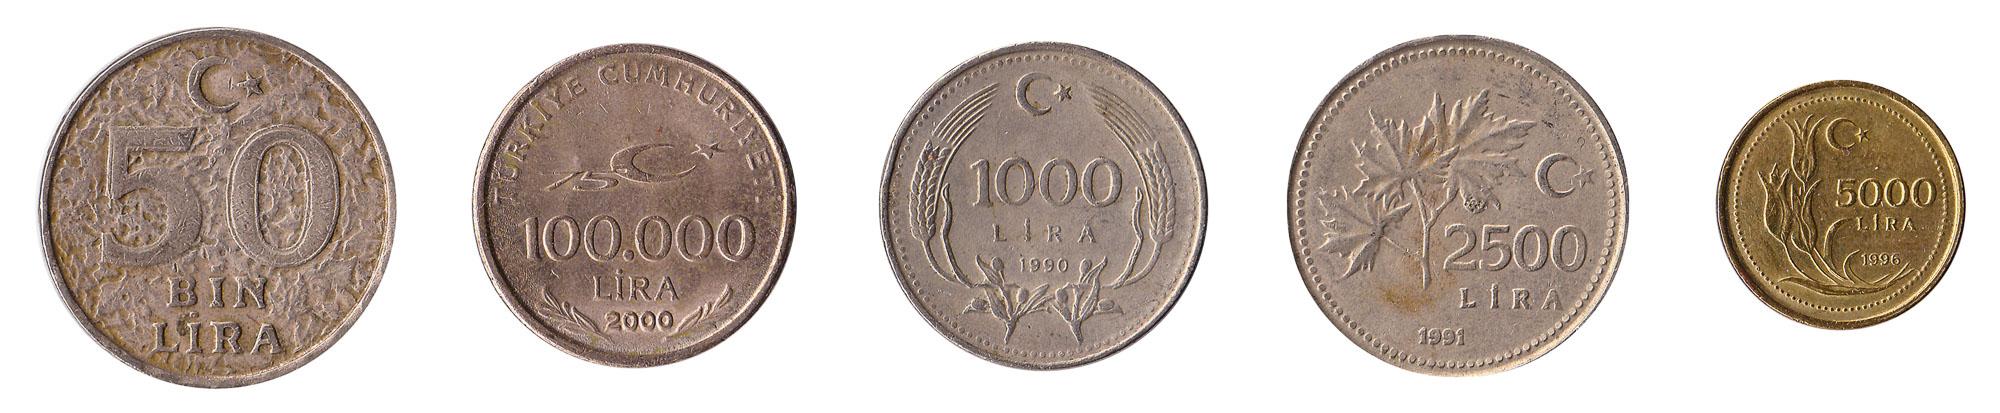 1000 lira coin Turkey inflation